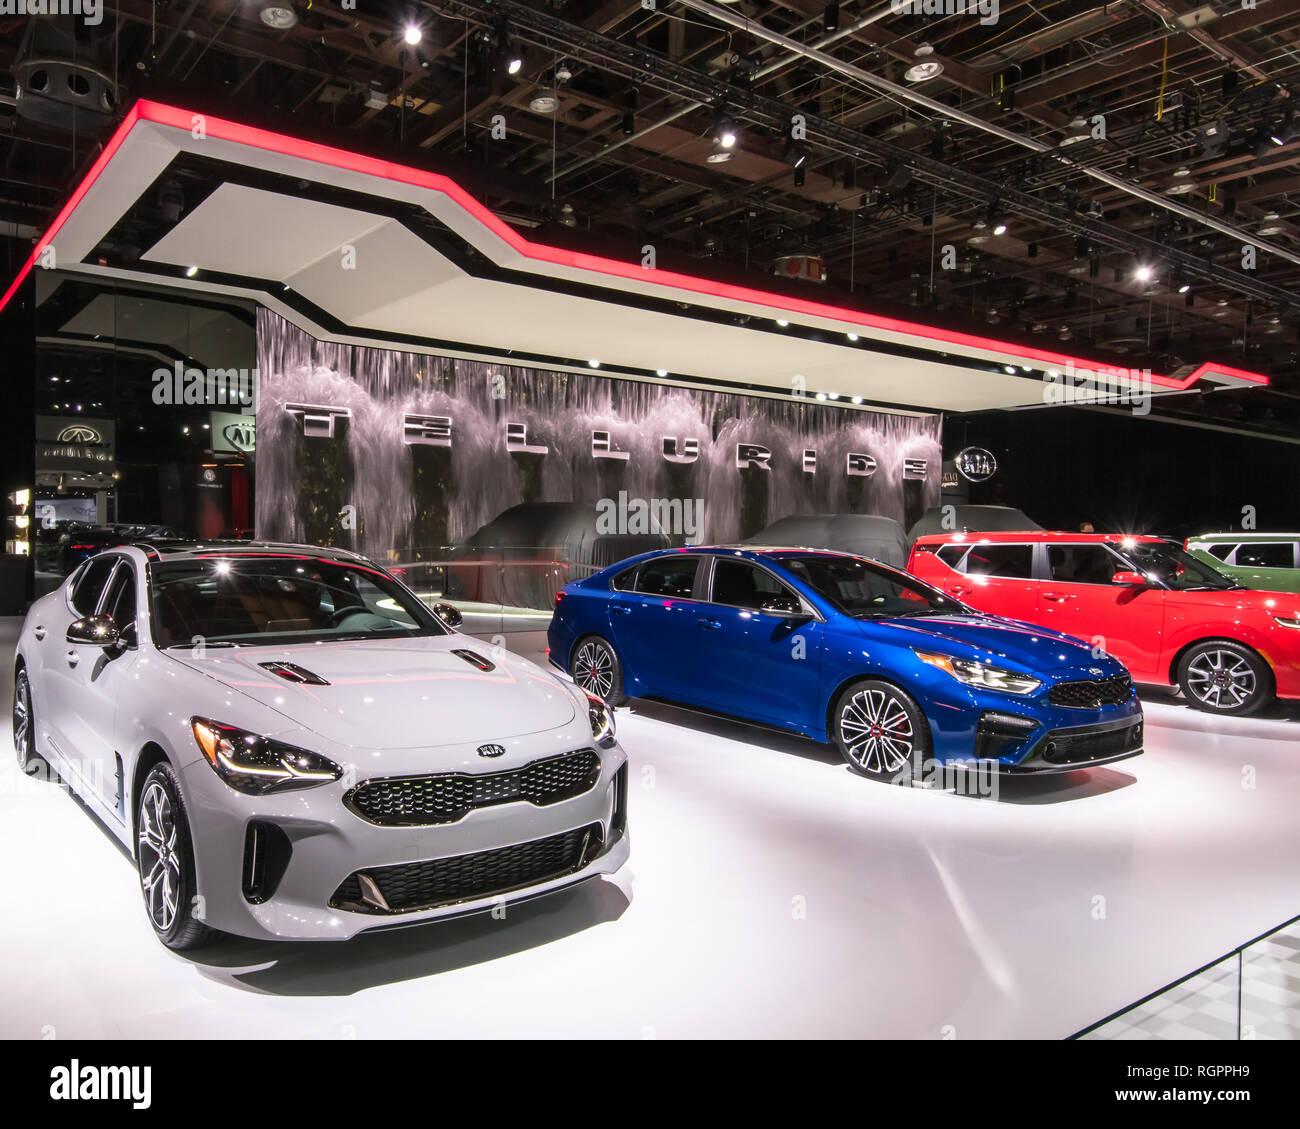 DETROIT, MI/USA - JANUARY 14, 2019: A 2019 Kia Stinger GT, Kia Forte GT and Kia Soul GT at the North American International Auto Show (NAIAS). - Stock Image